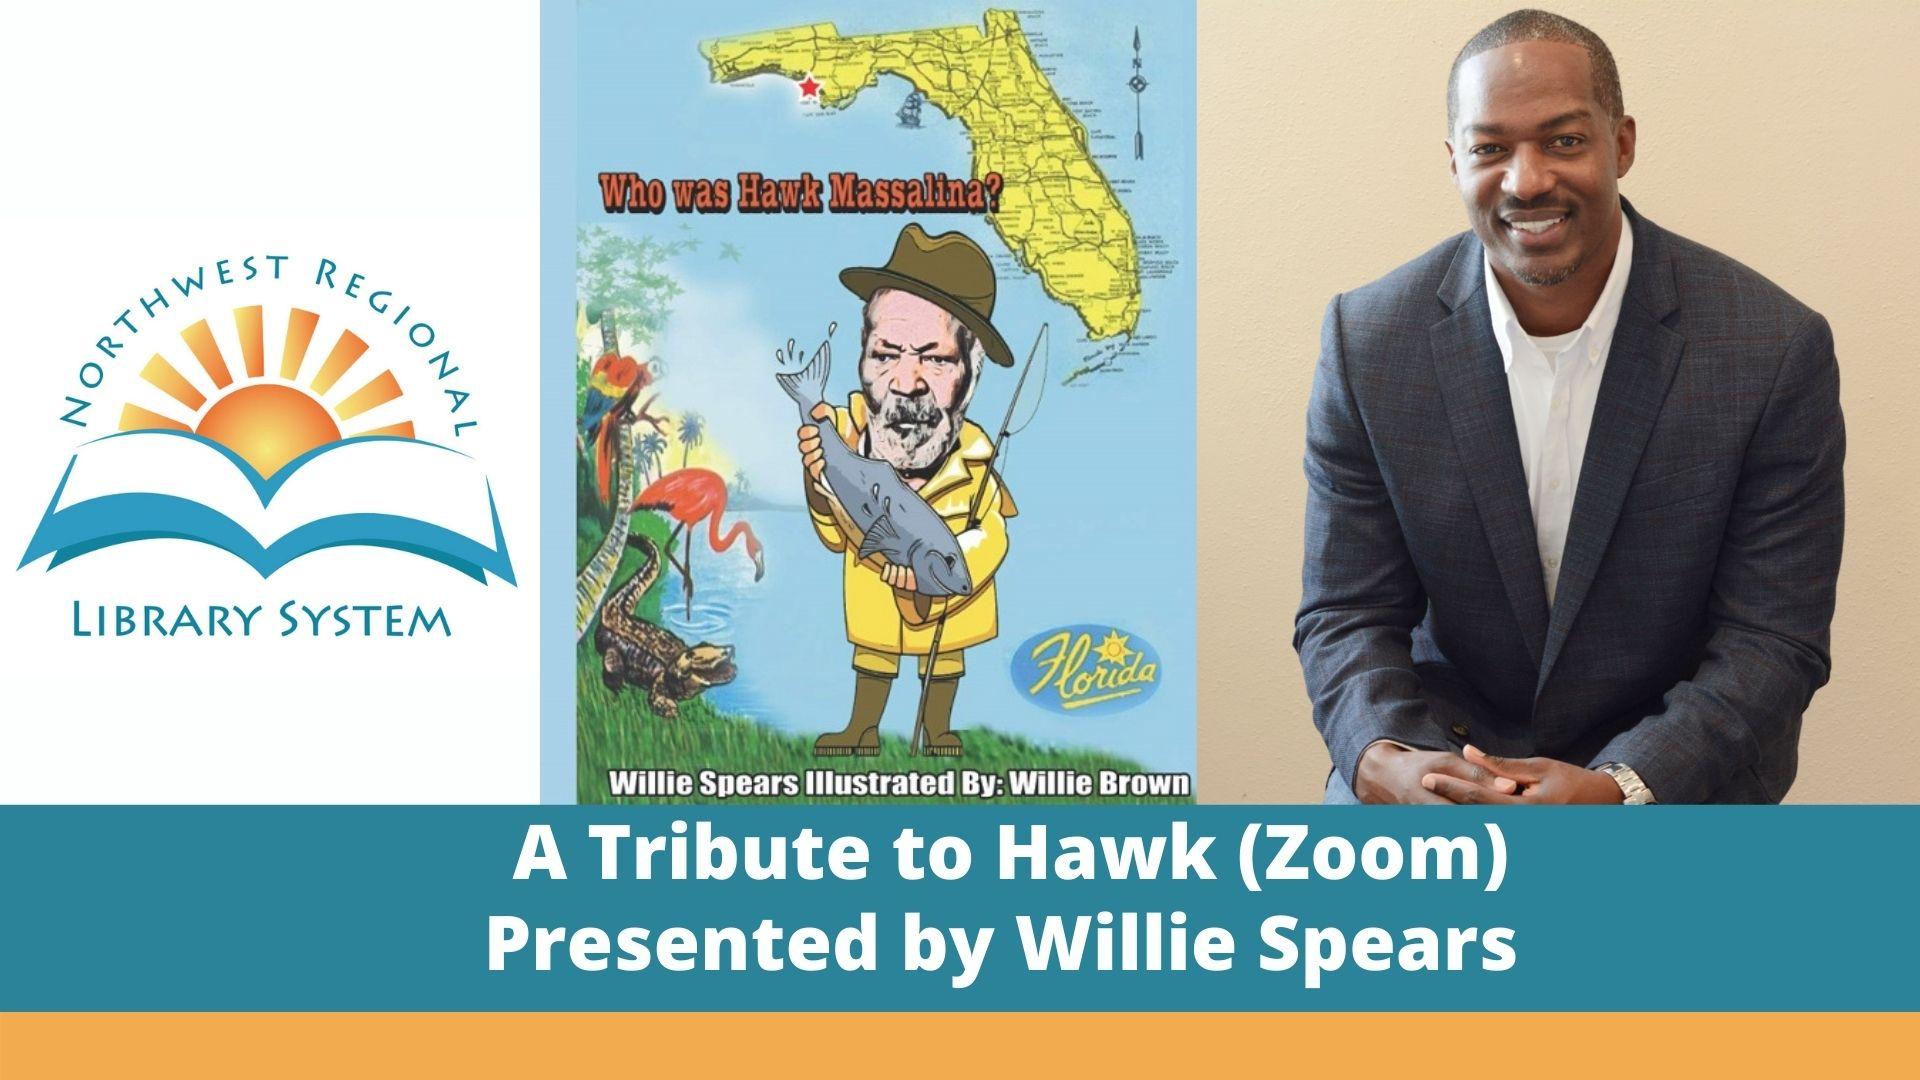 A Tribute to Hawk